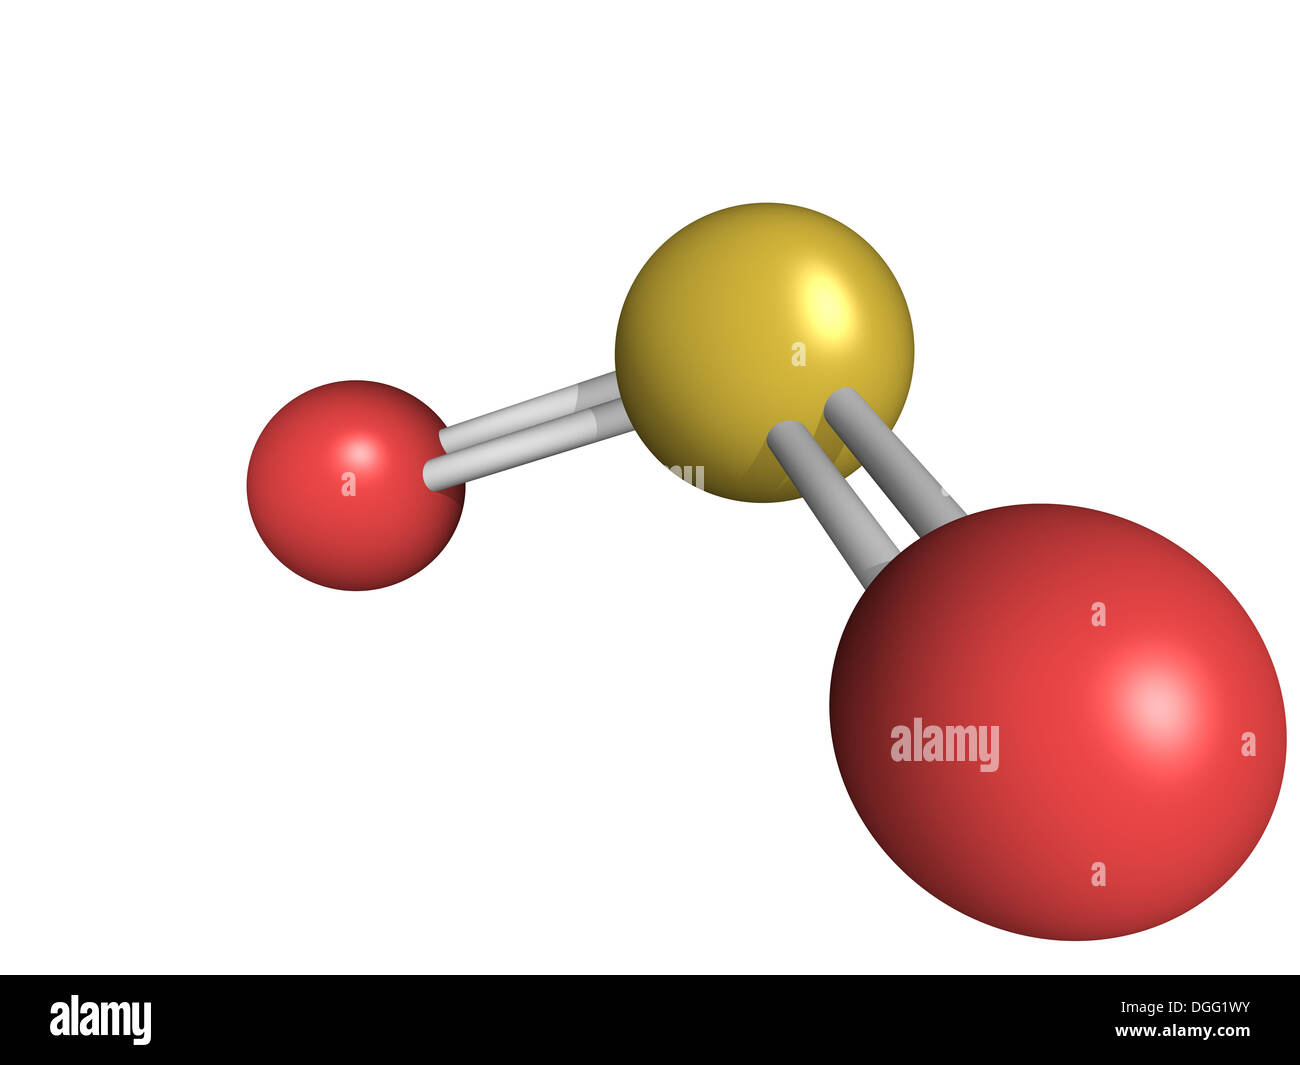 Sulfur Dioxide Molecule Related Keywords - Sulfur Dioxide ...